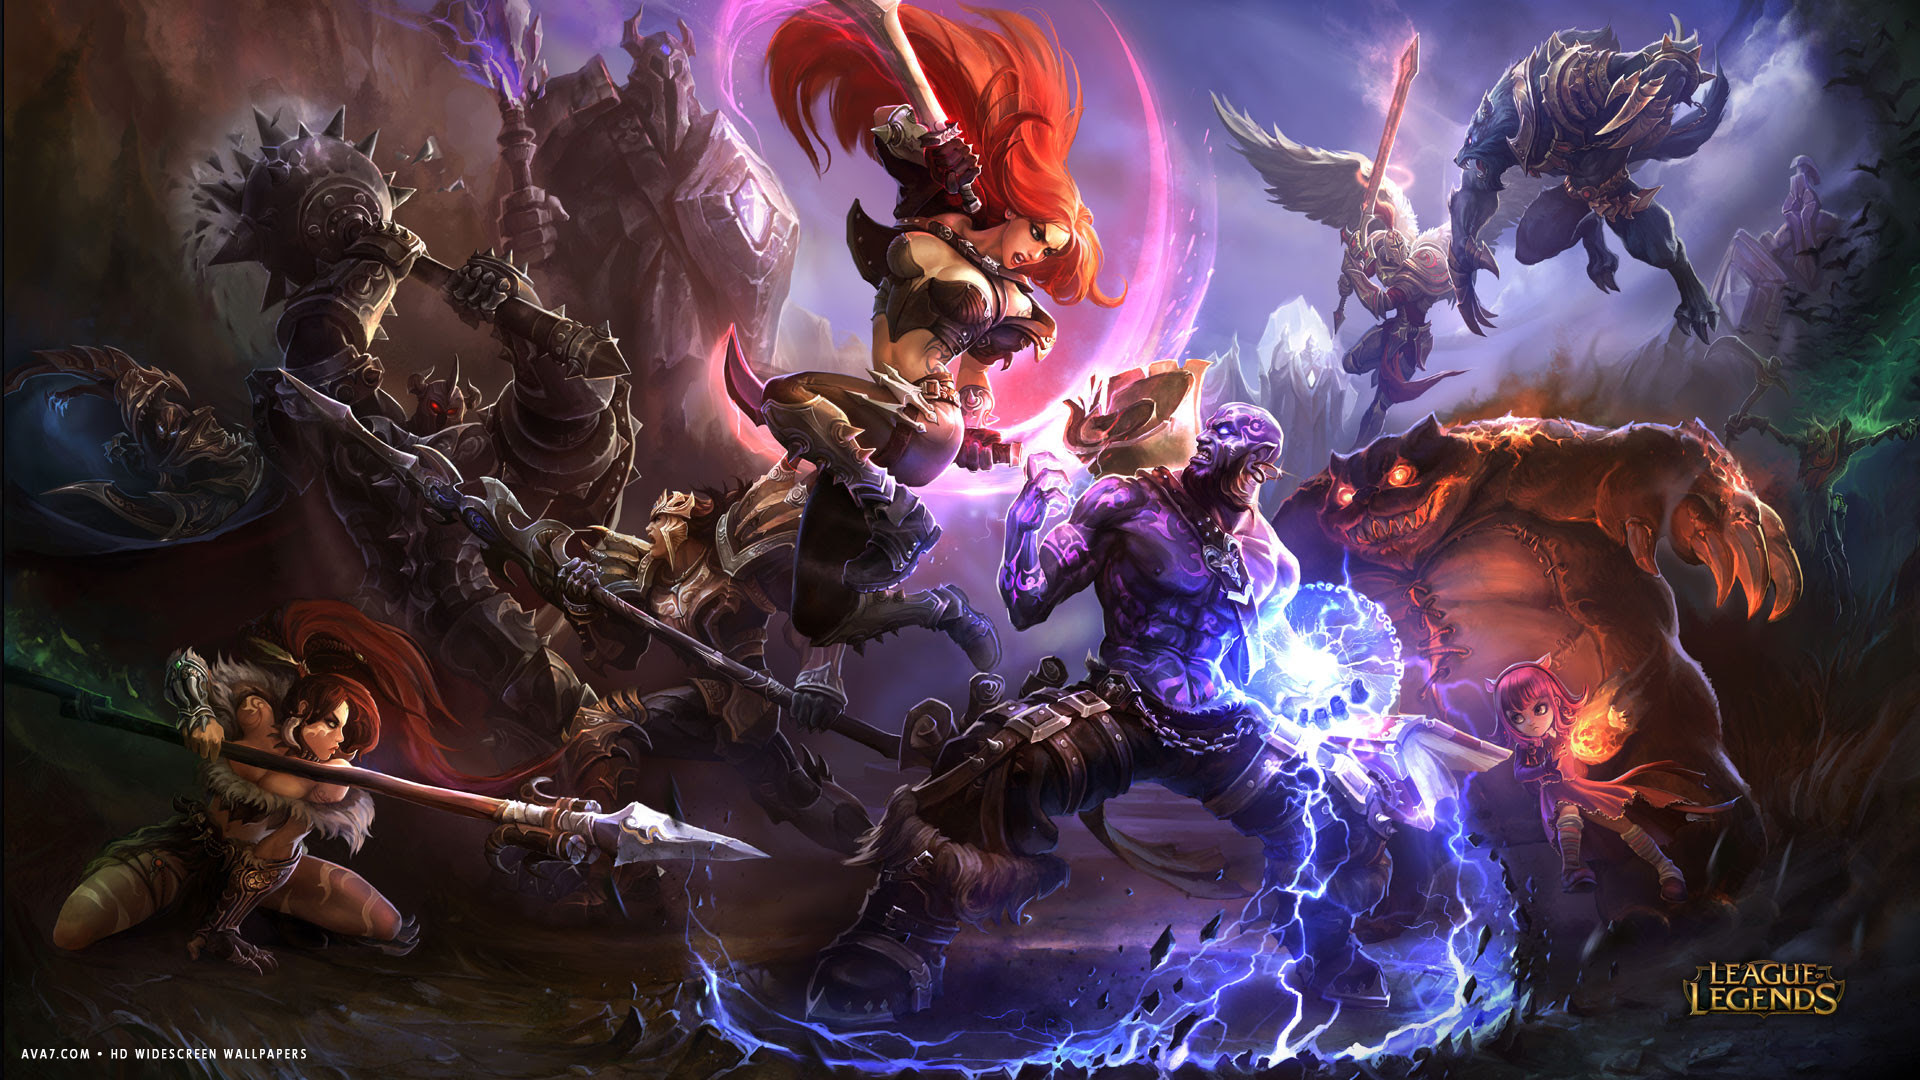 League Of Legends Game Lol Katarina Versus Ryze Magic Battle Hd